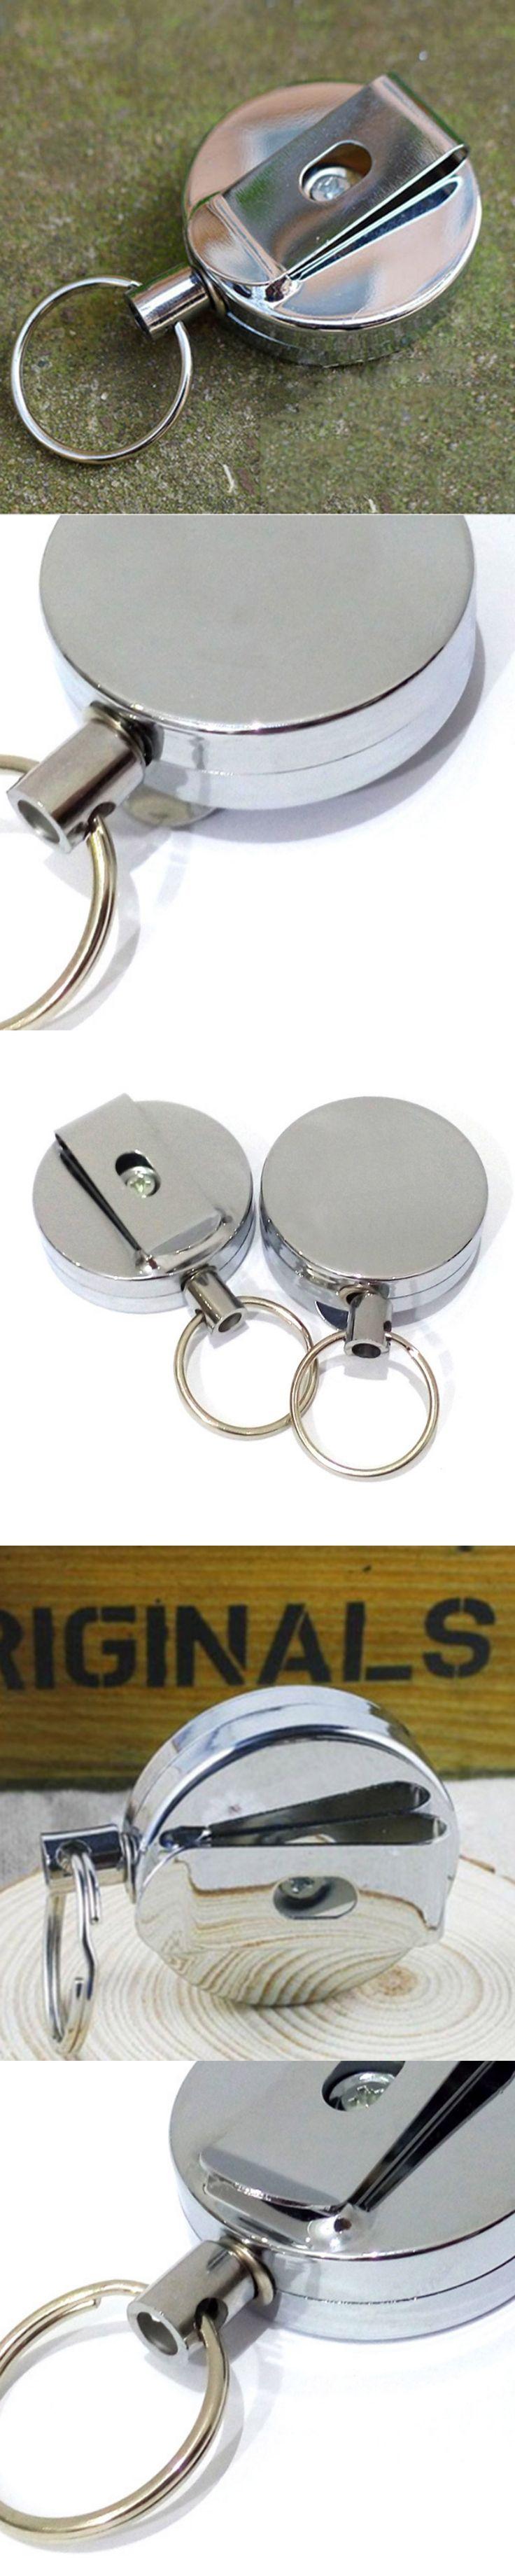 2016 hot sale Metal car key holder key bag holder  Recoil Key Ring Belt Clip pendant for bag man keychain cover EyJb